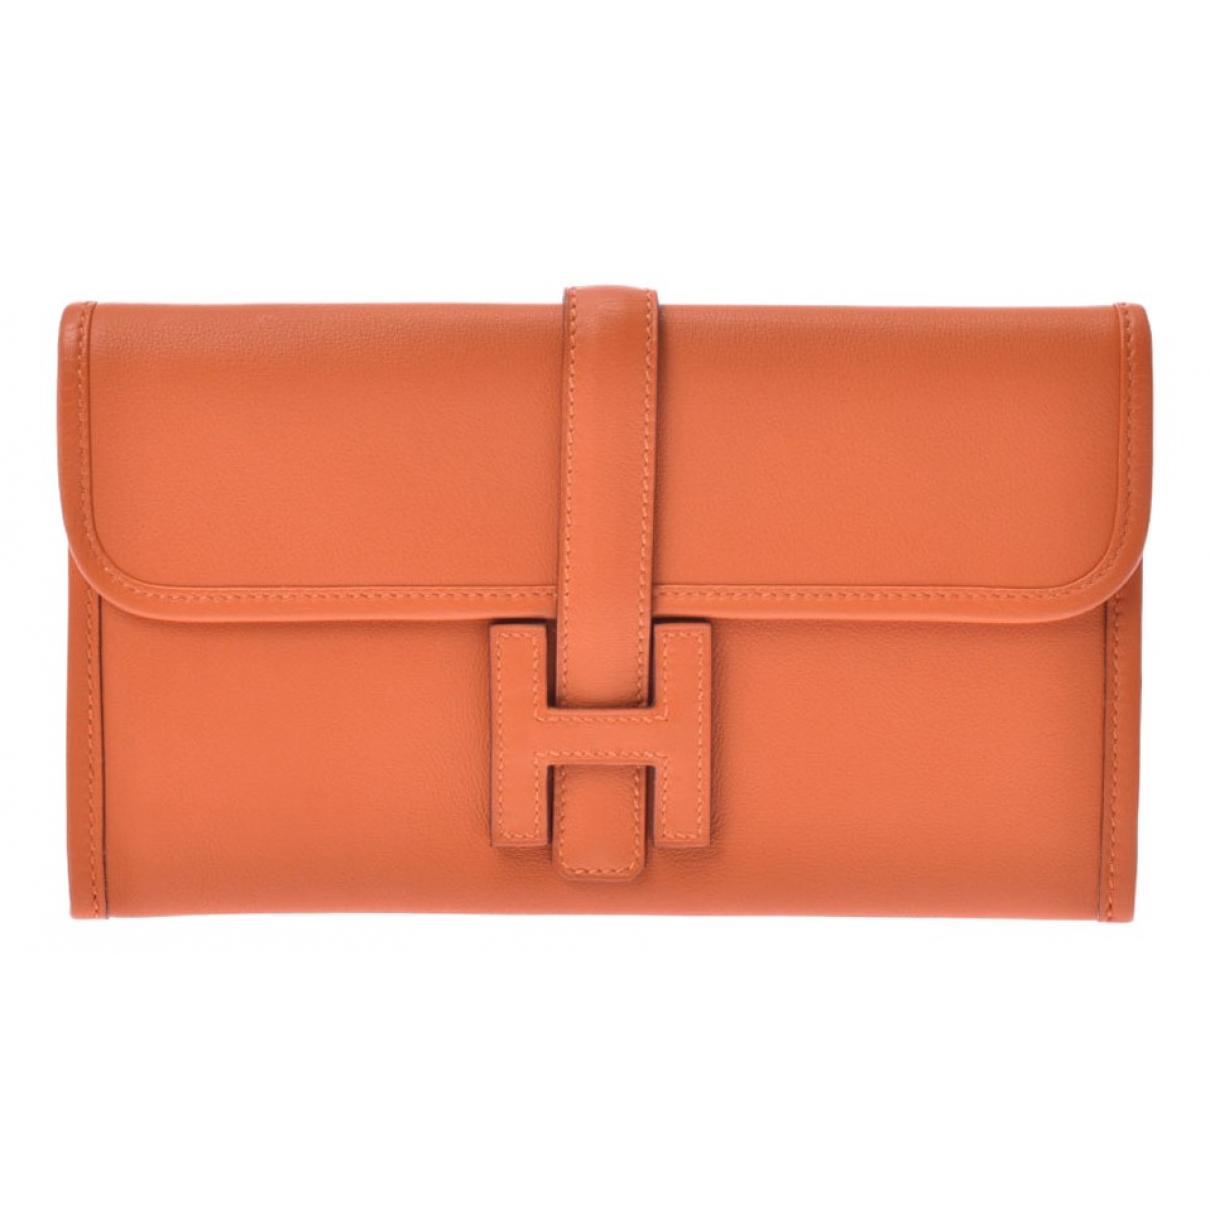 Hermes - Pochette Jige pour femme en cuir - orange